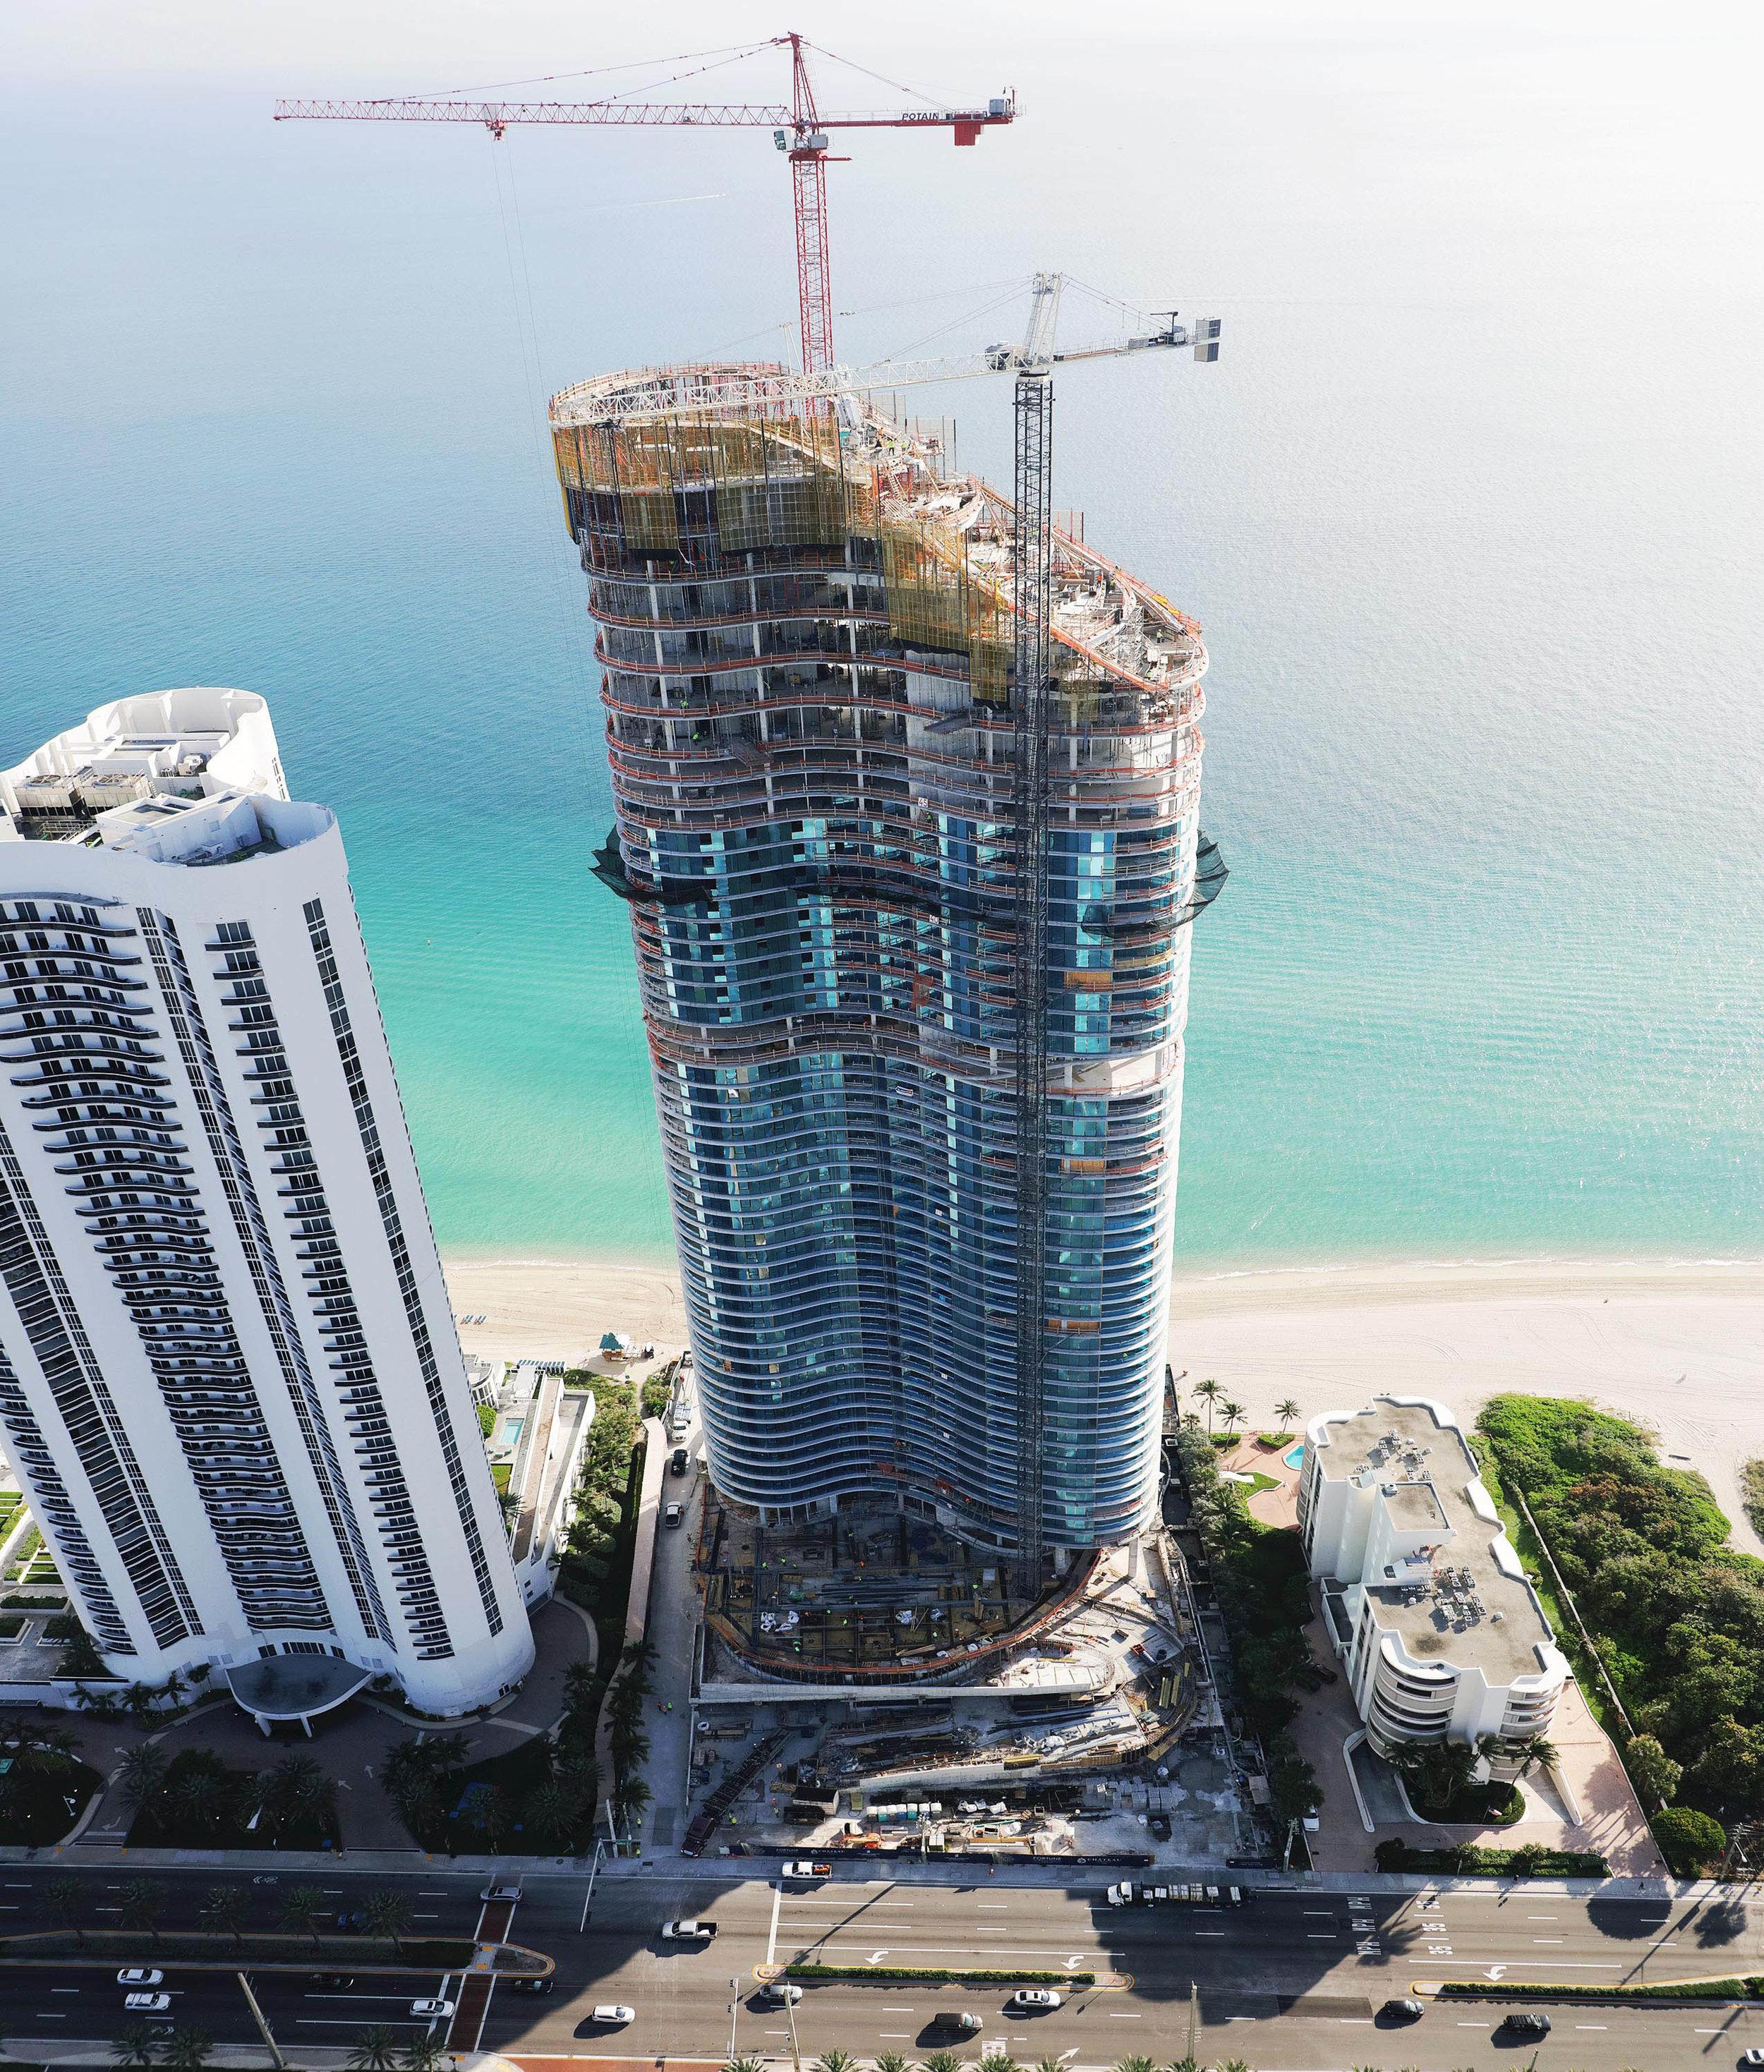 The Ritz-Carlton Residences, Sunny Isles Beach Tops Off_11.30.18_1.jpg